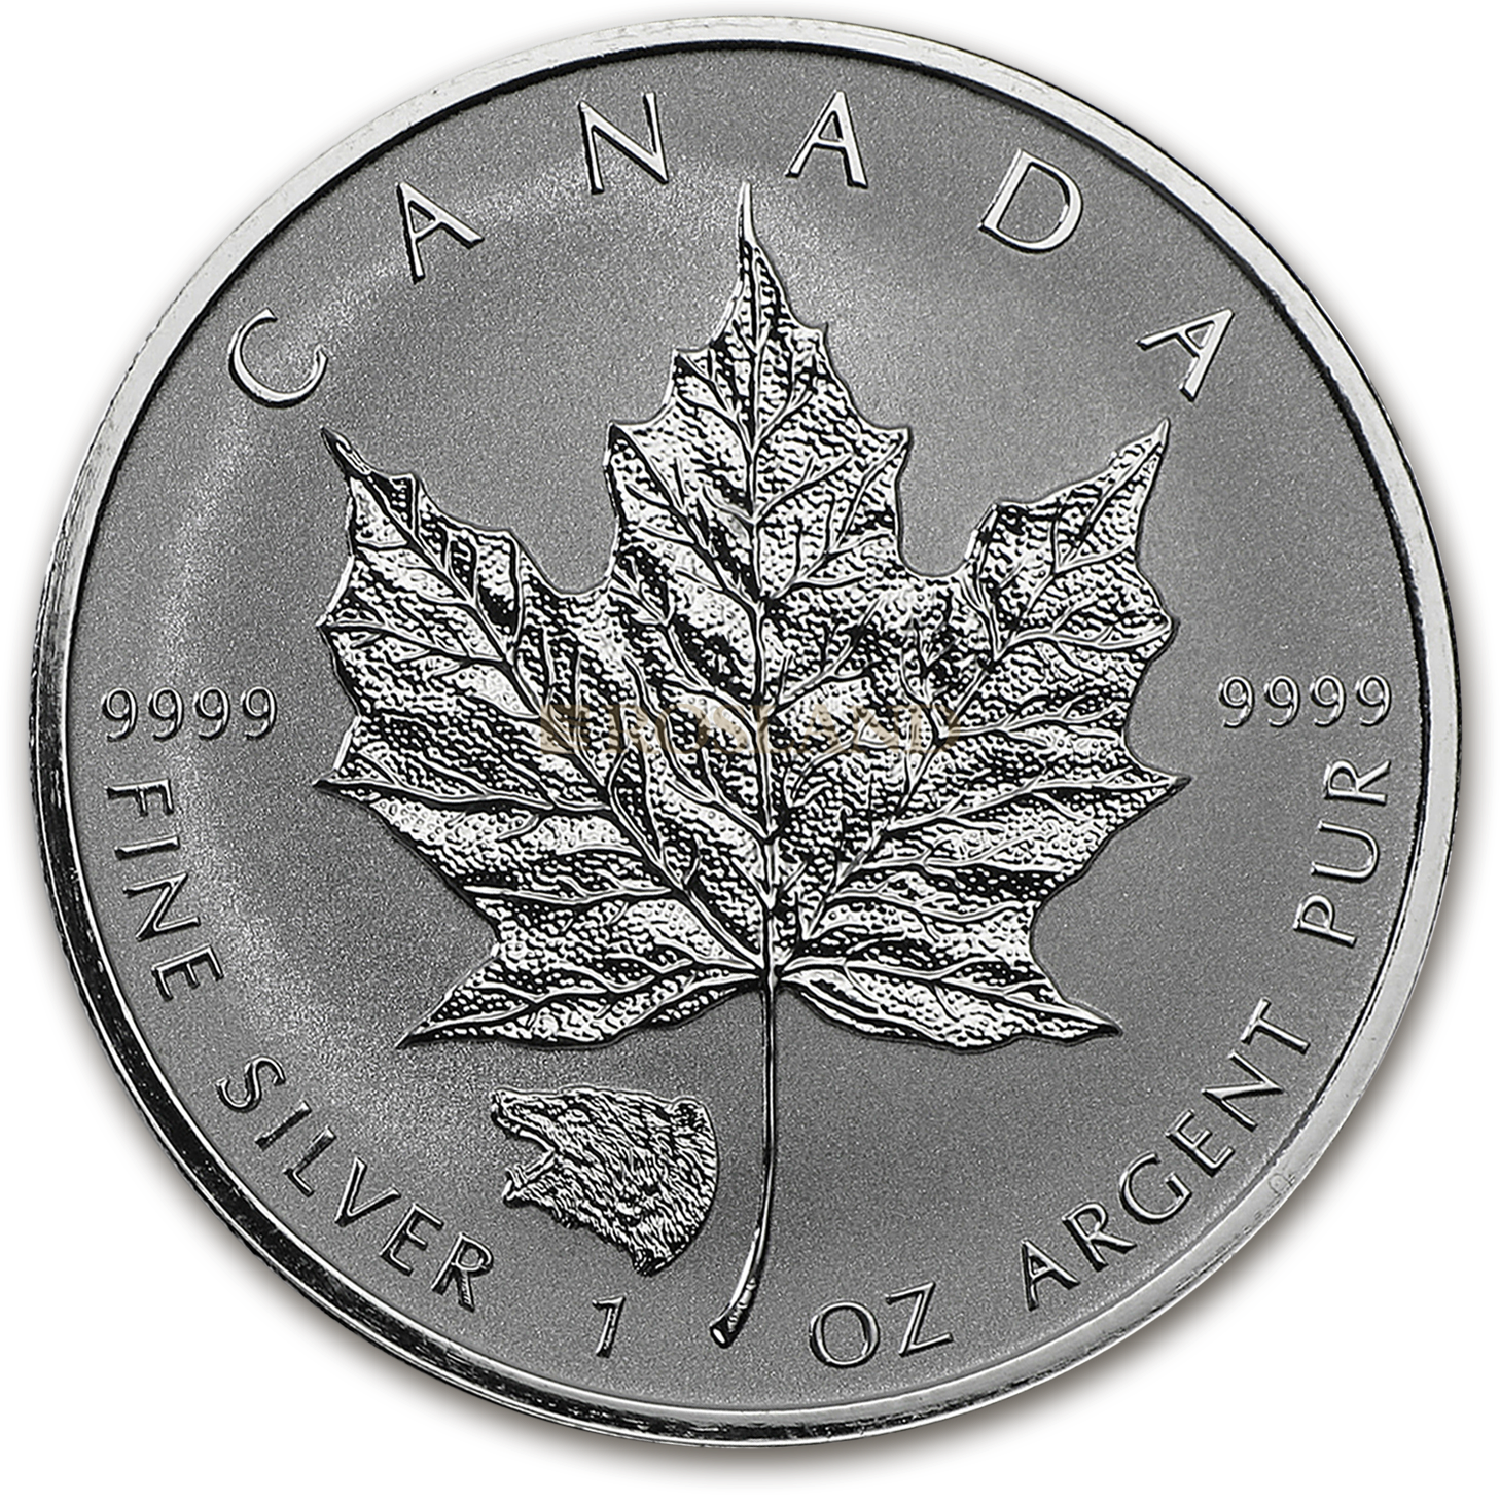 1 Unze Silbermünze Kanada Maple Leaf Grizzly 2016 PP (Reverse Proof)